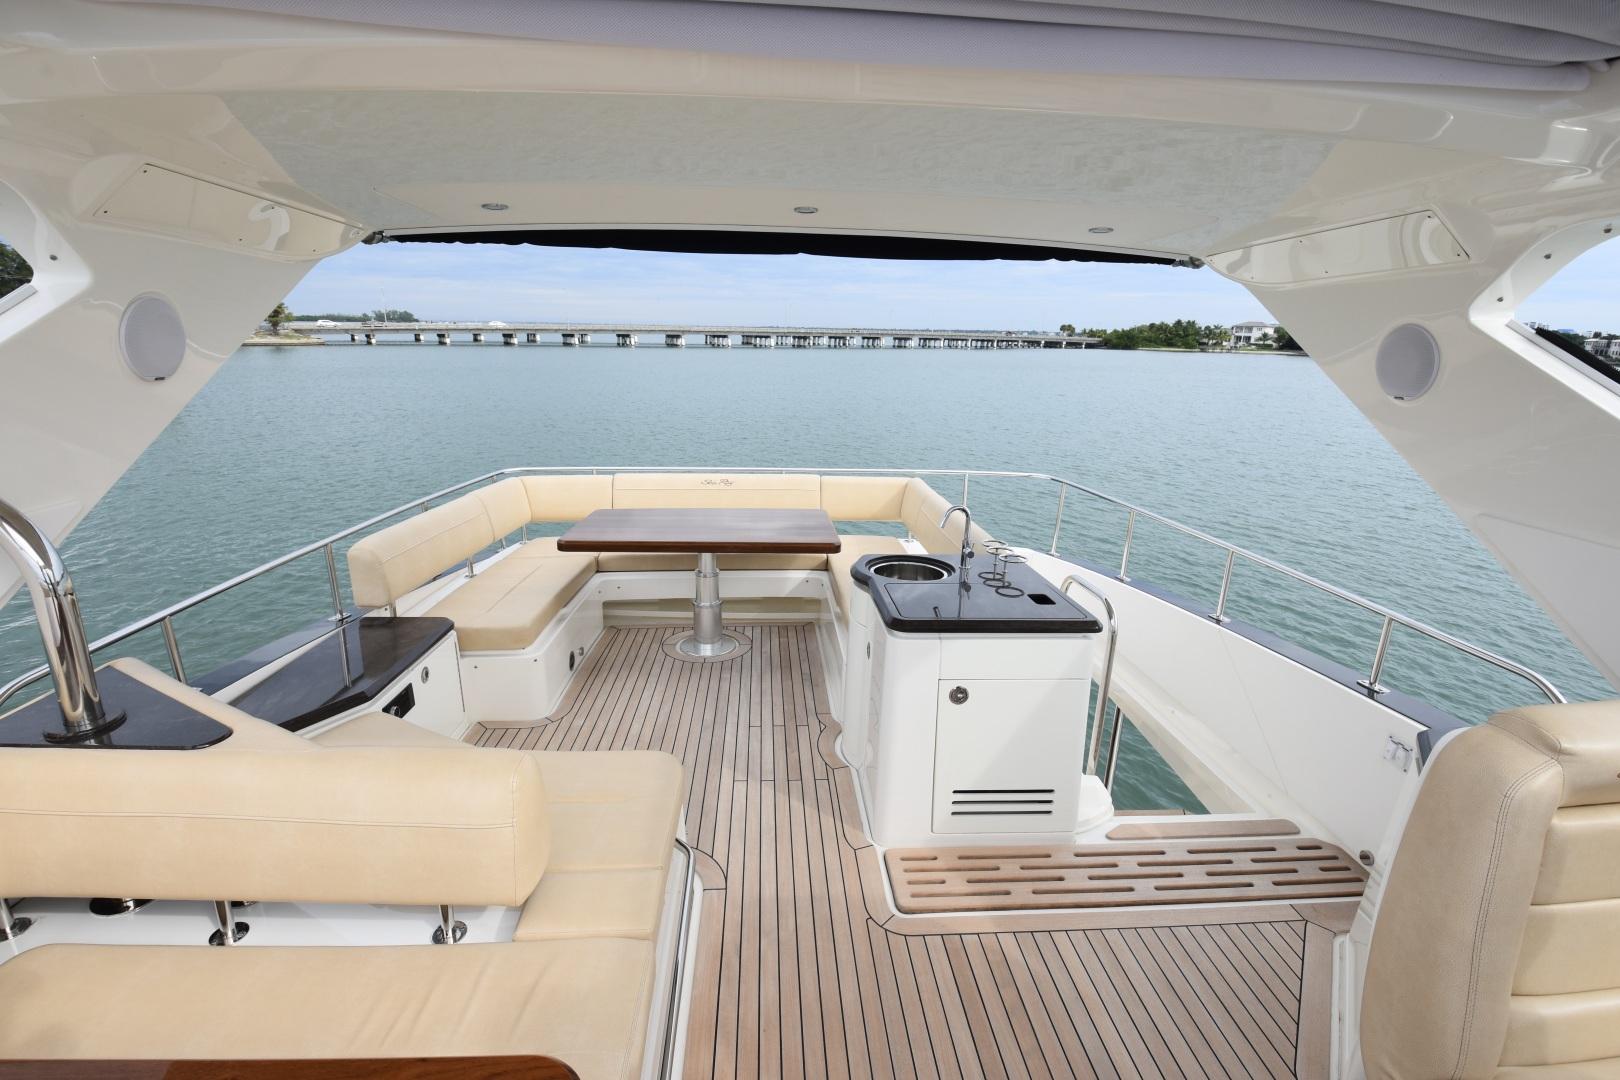 Sea Ray-L650 2016-3x's the Charm Longboat Key-Florida-United States-2016 Sea Ray L650  3x's the Charm  Flybridge-1251857 | Thumbnail